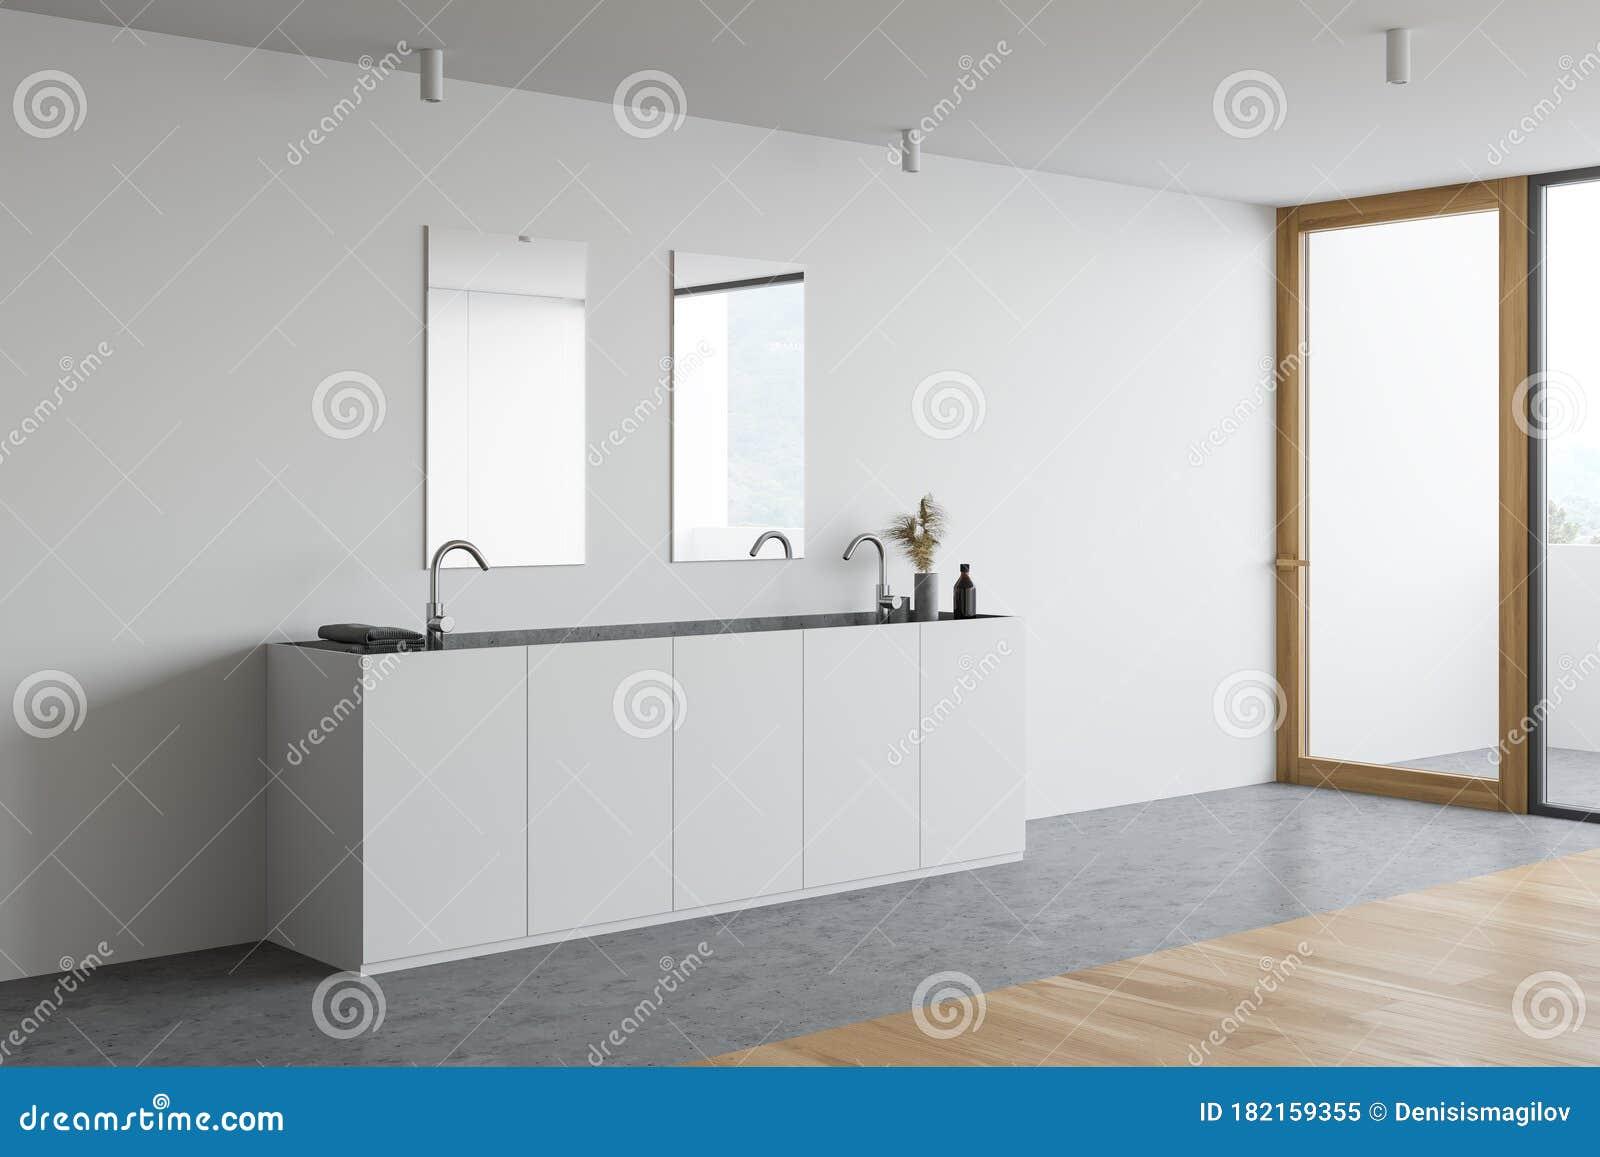 Double Sink In Minimalistic White Bathroom Corner Stock Illustration Illustration Of Inside Model 182159355